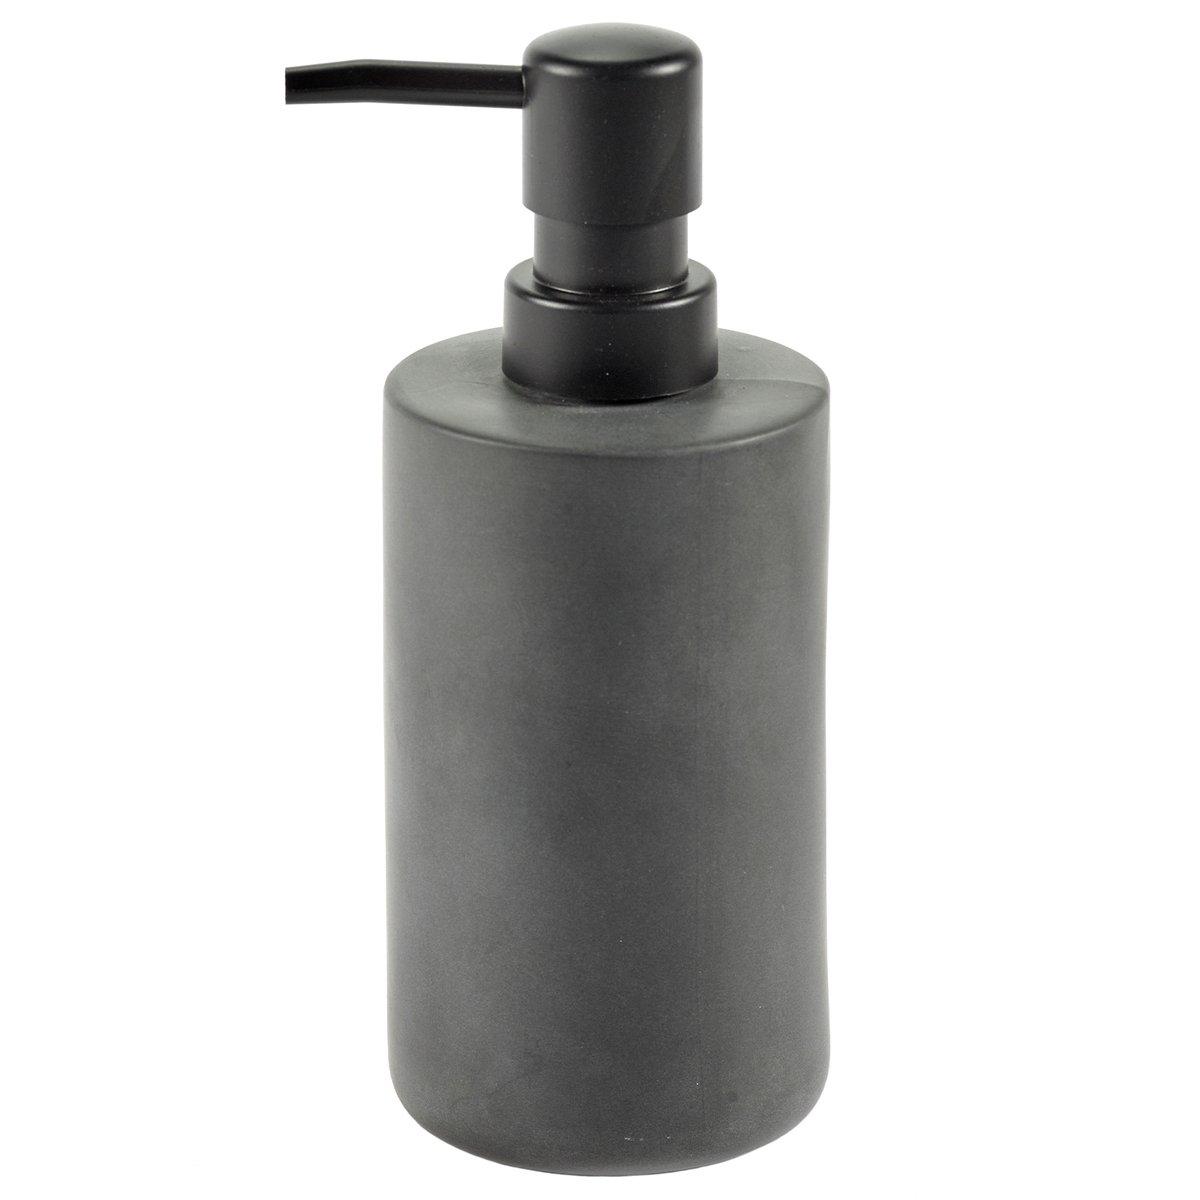 Serax Cose Soap Dispenser, Dark Grey